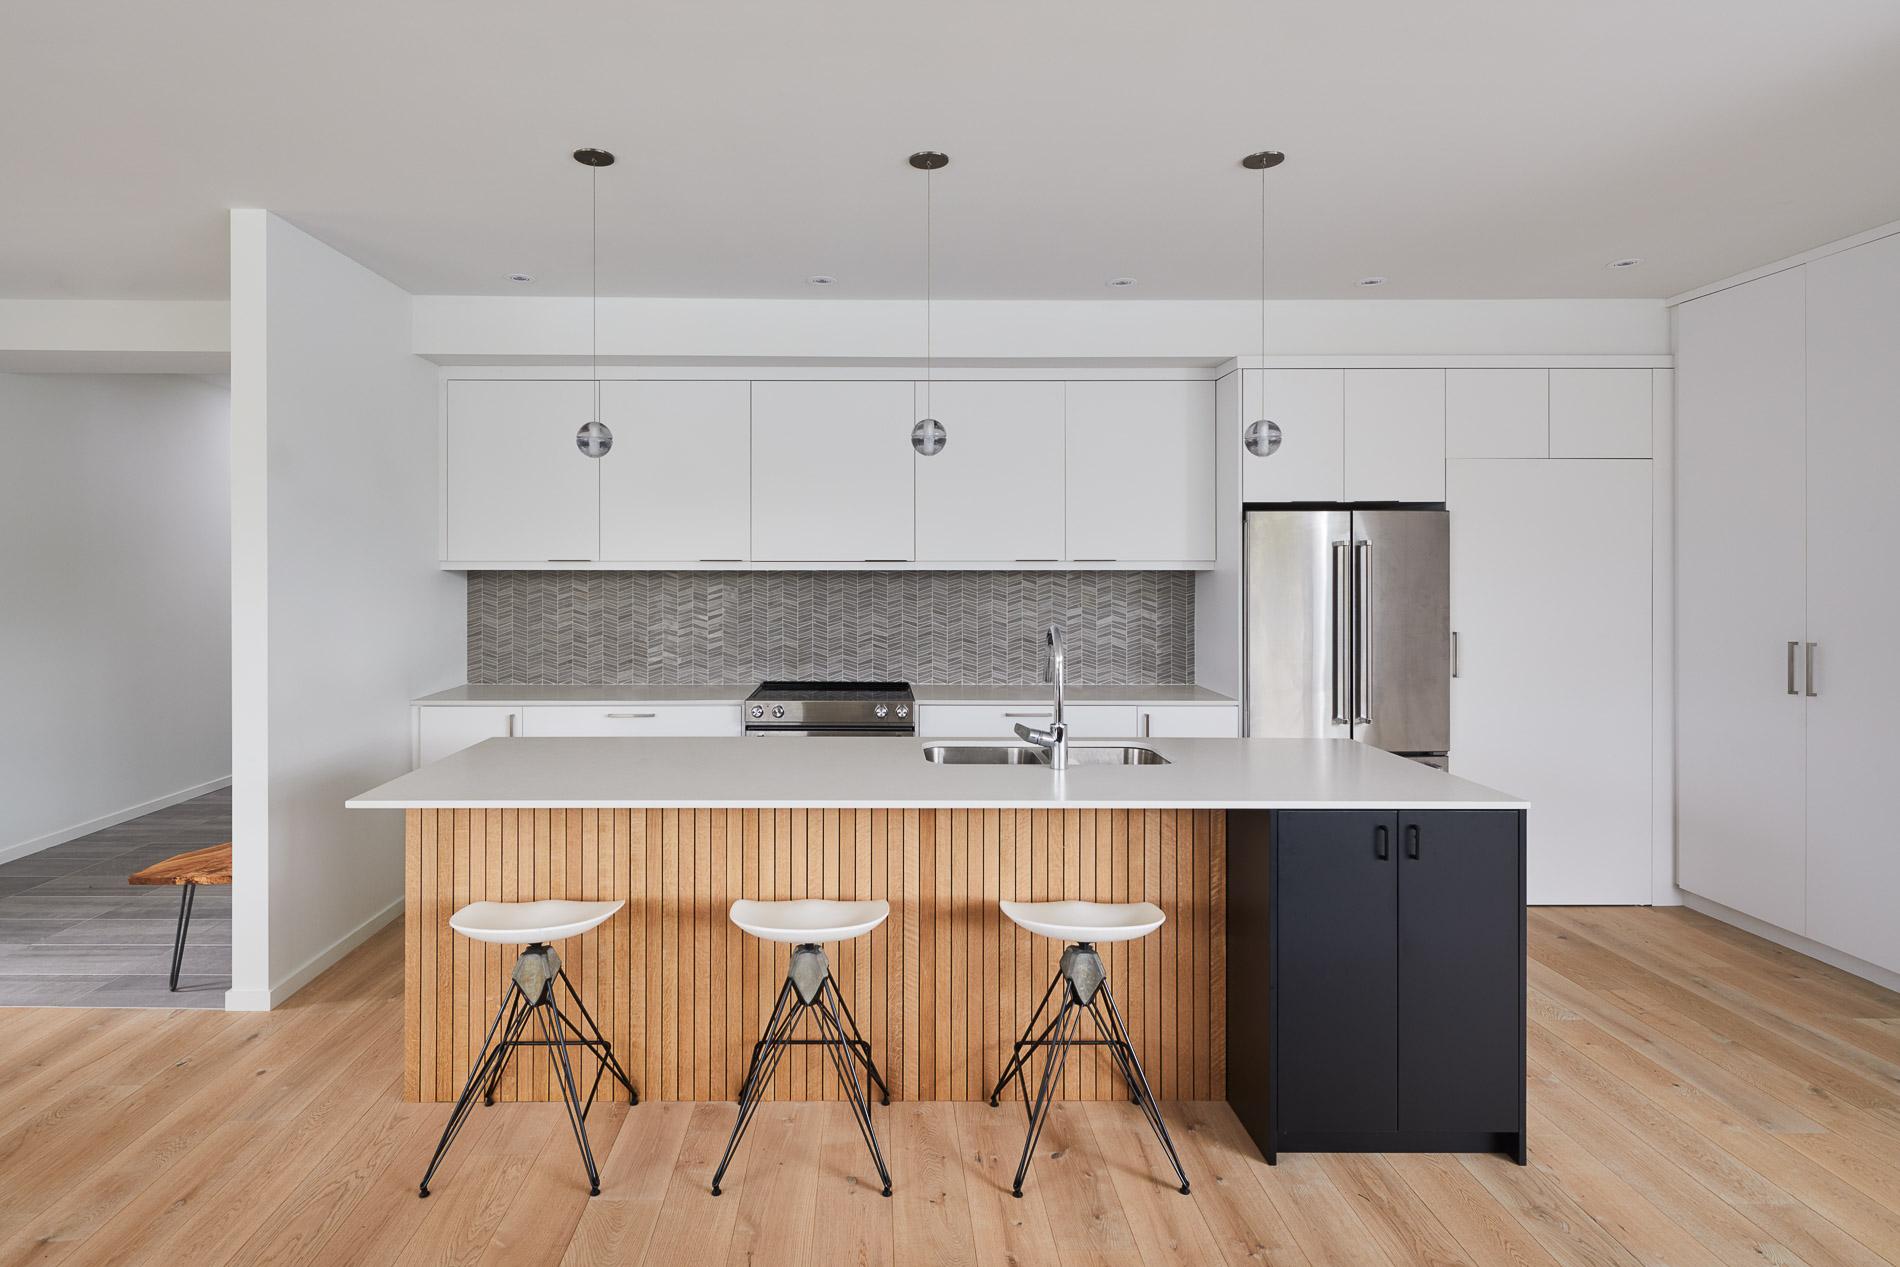 002-Shean Architects Val des Monts.jpg